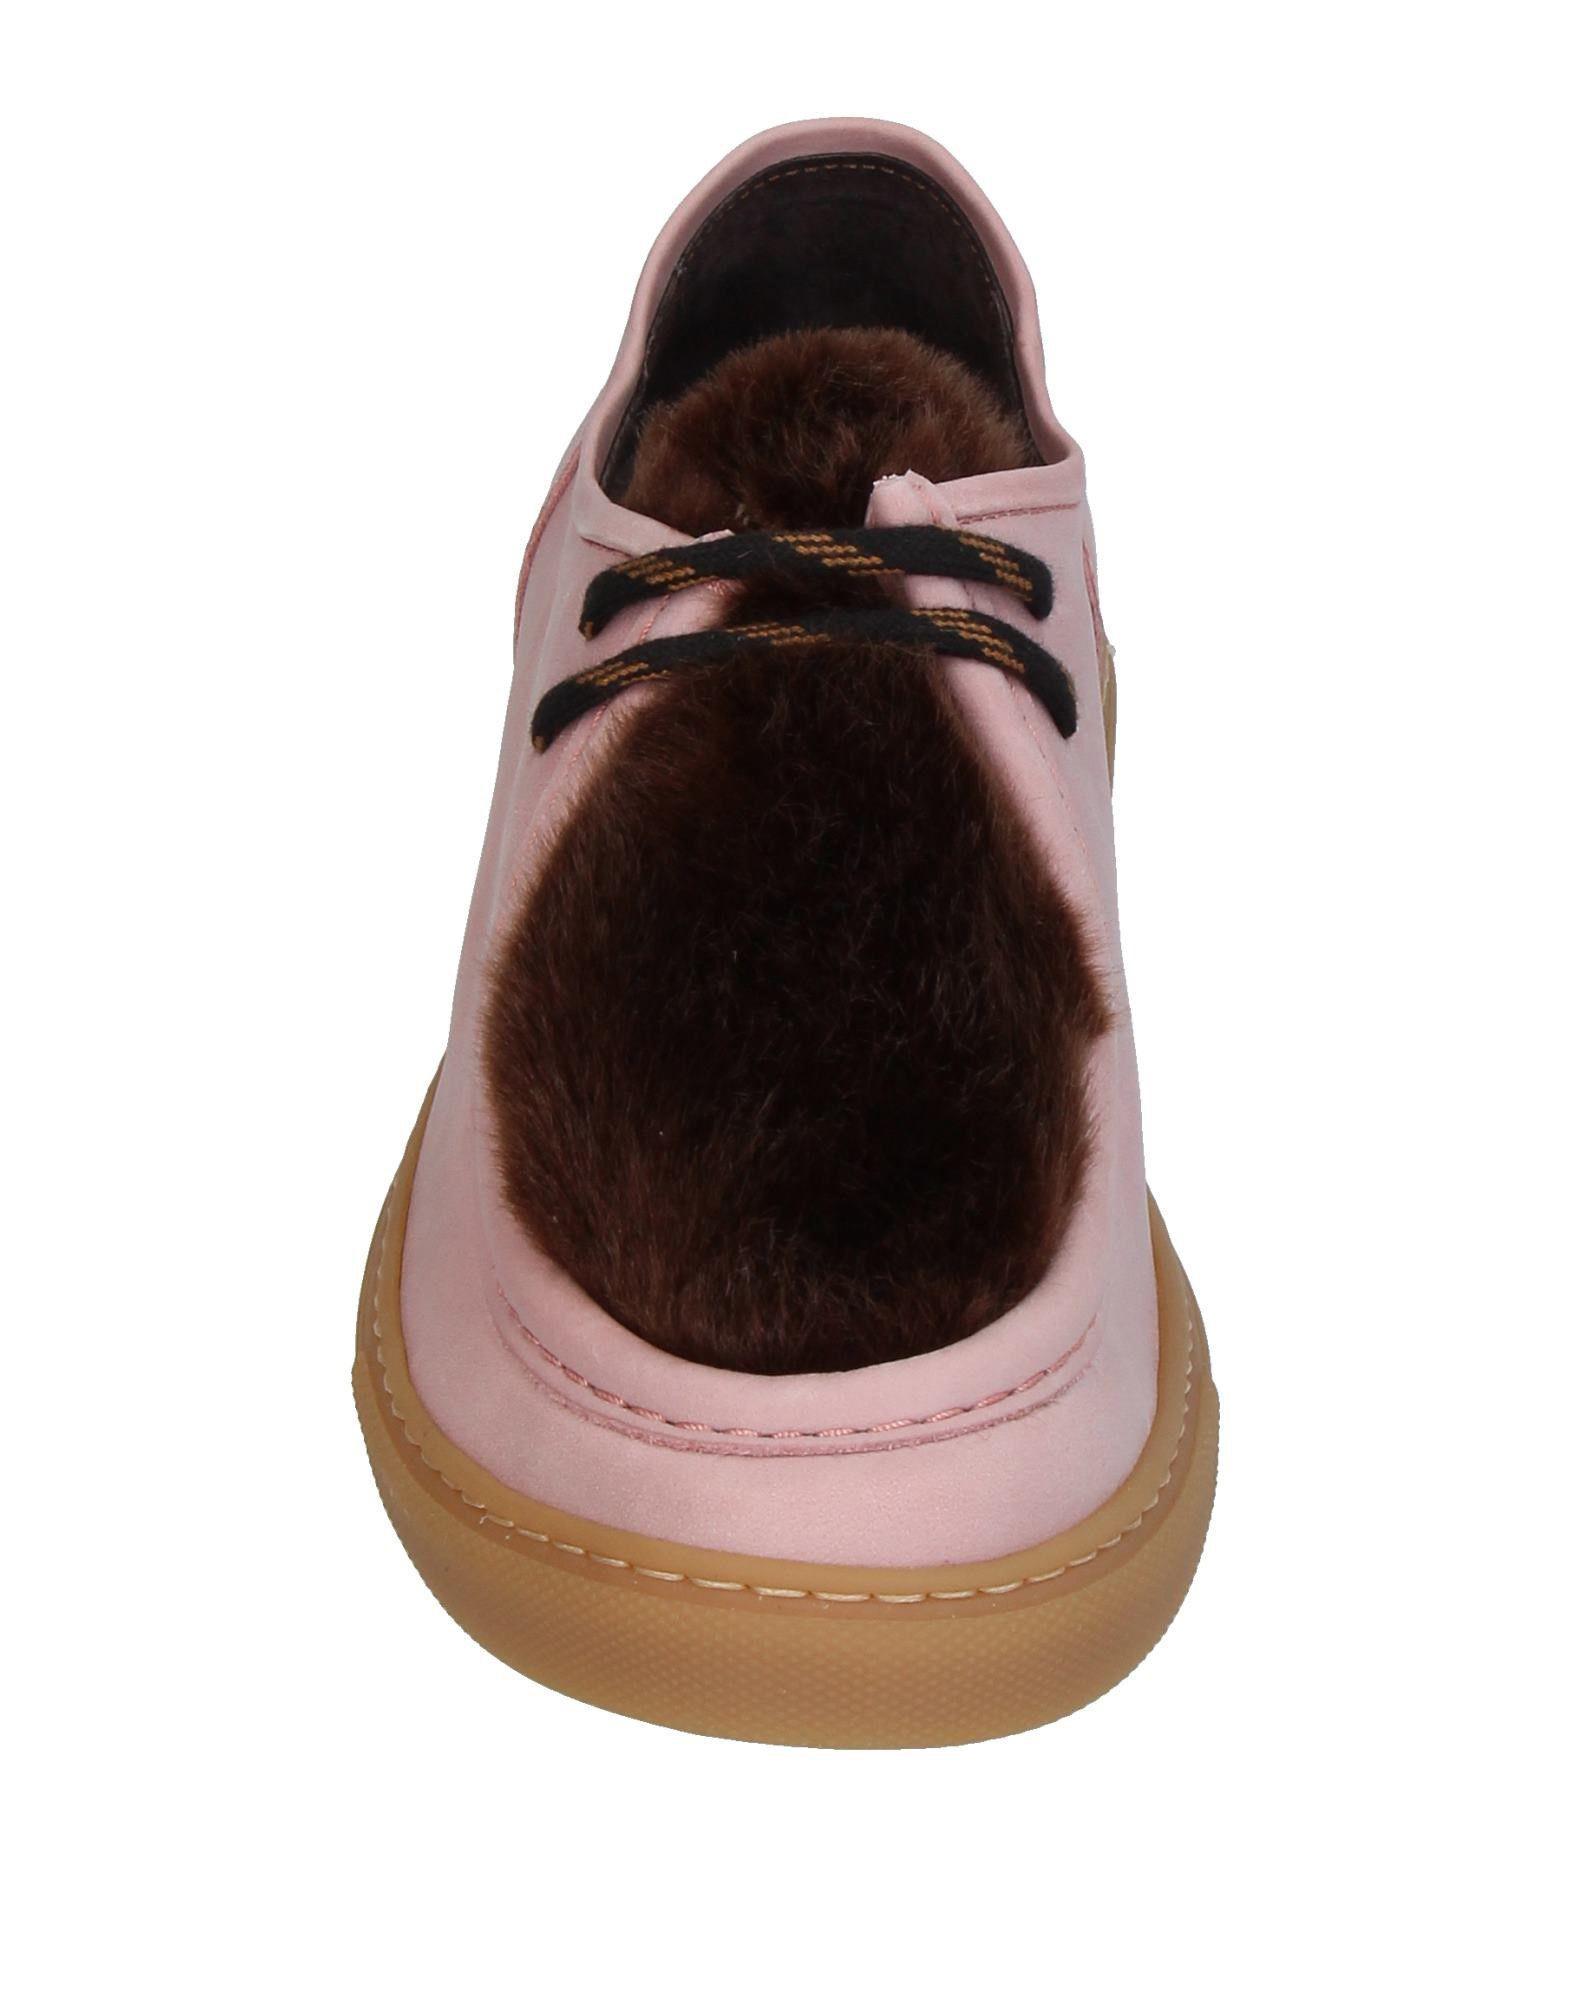 FOOTWEAR - Lace-up shoes Via Vela 14 gytWwf2